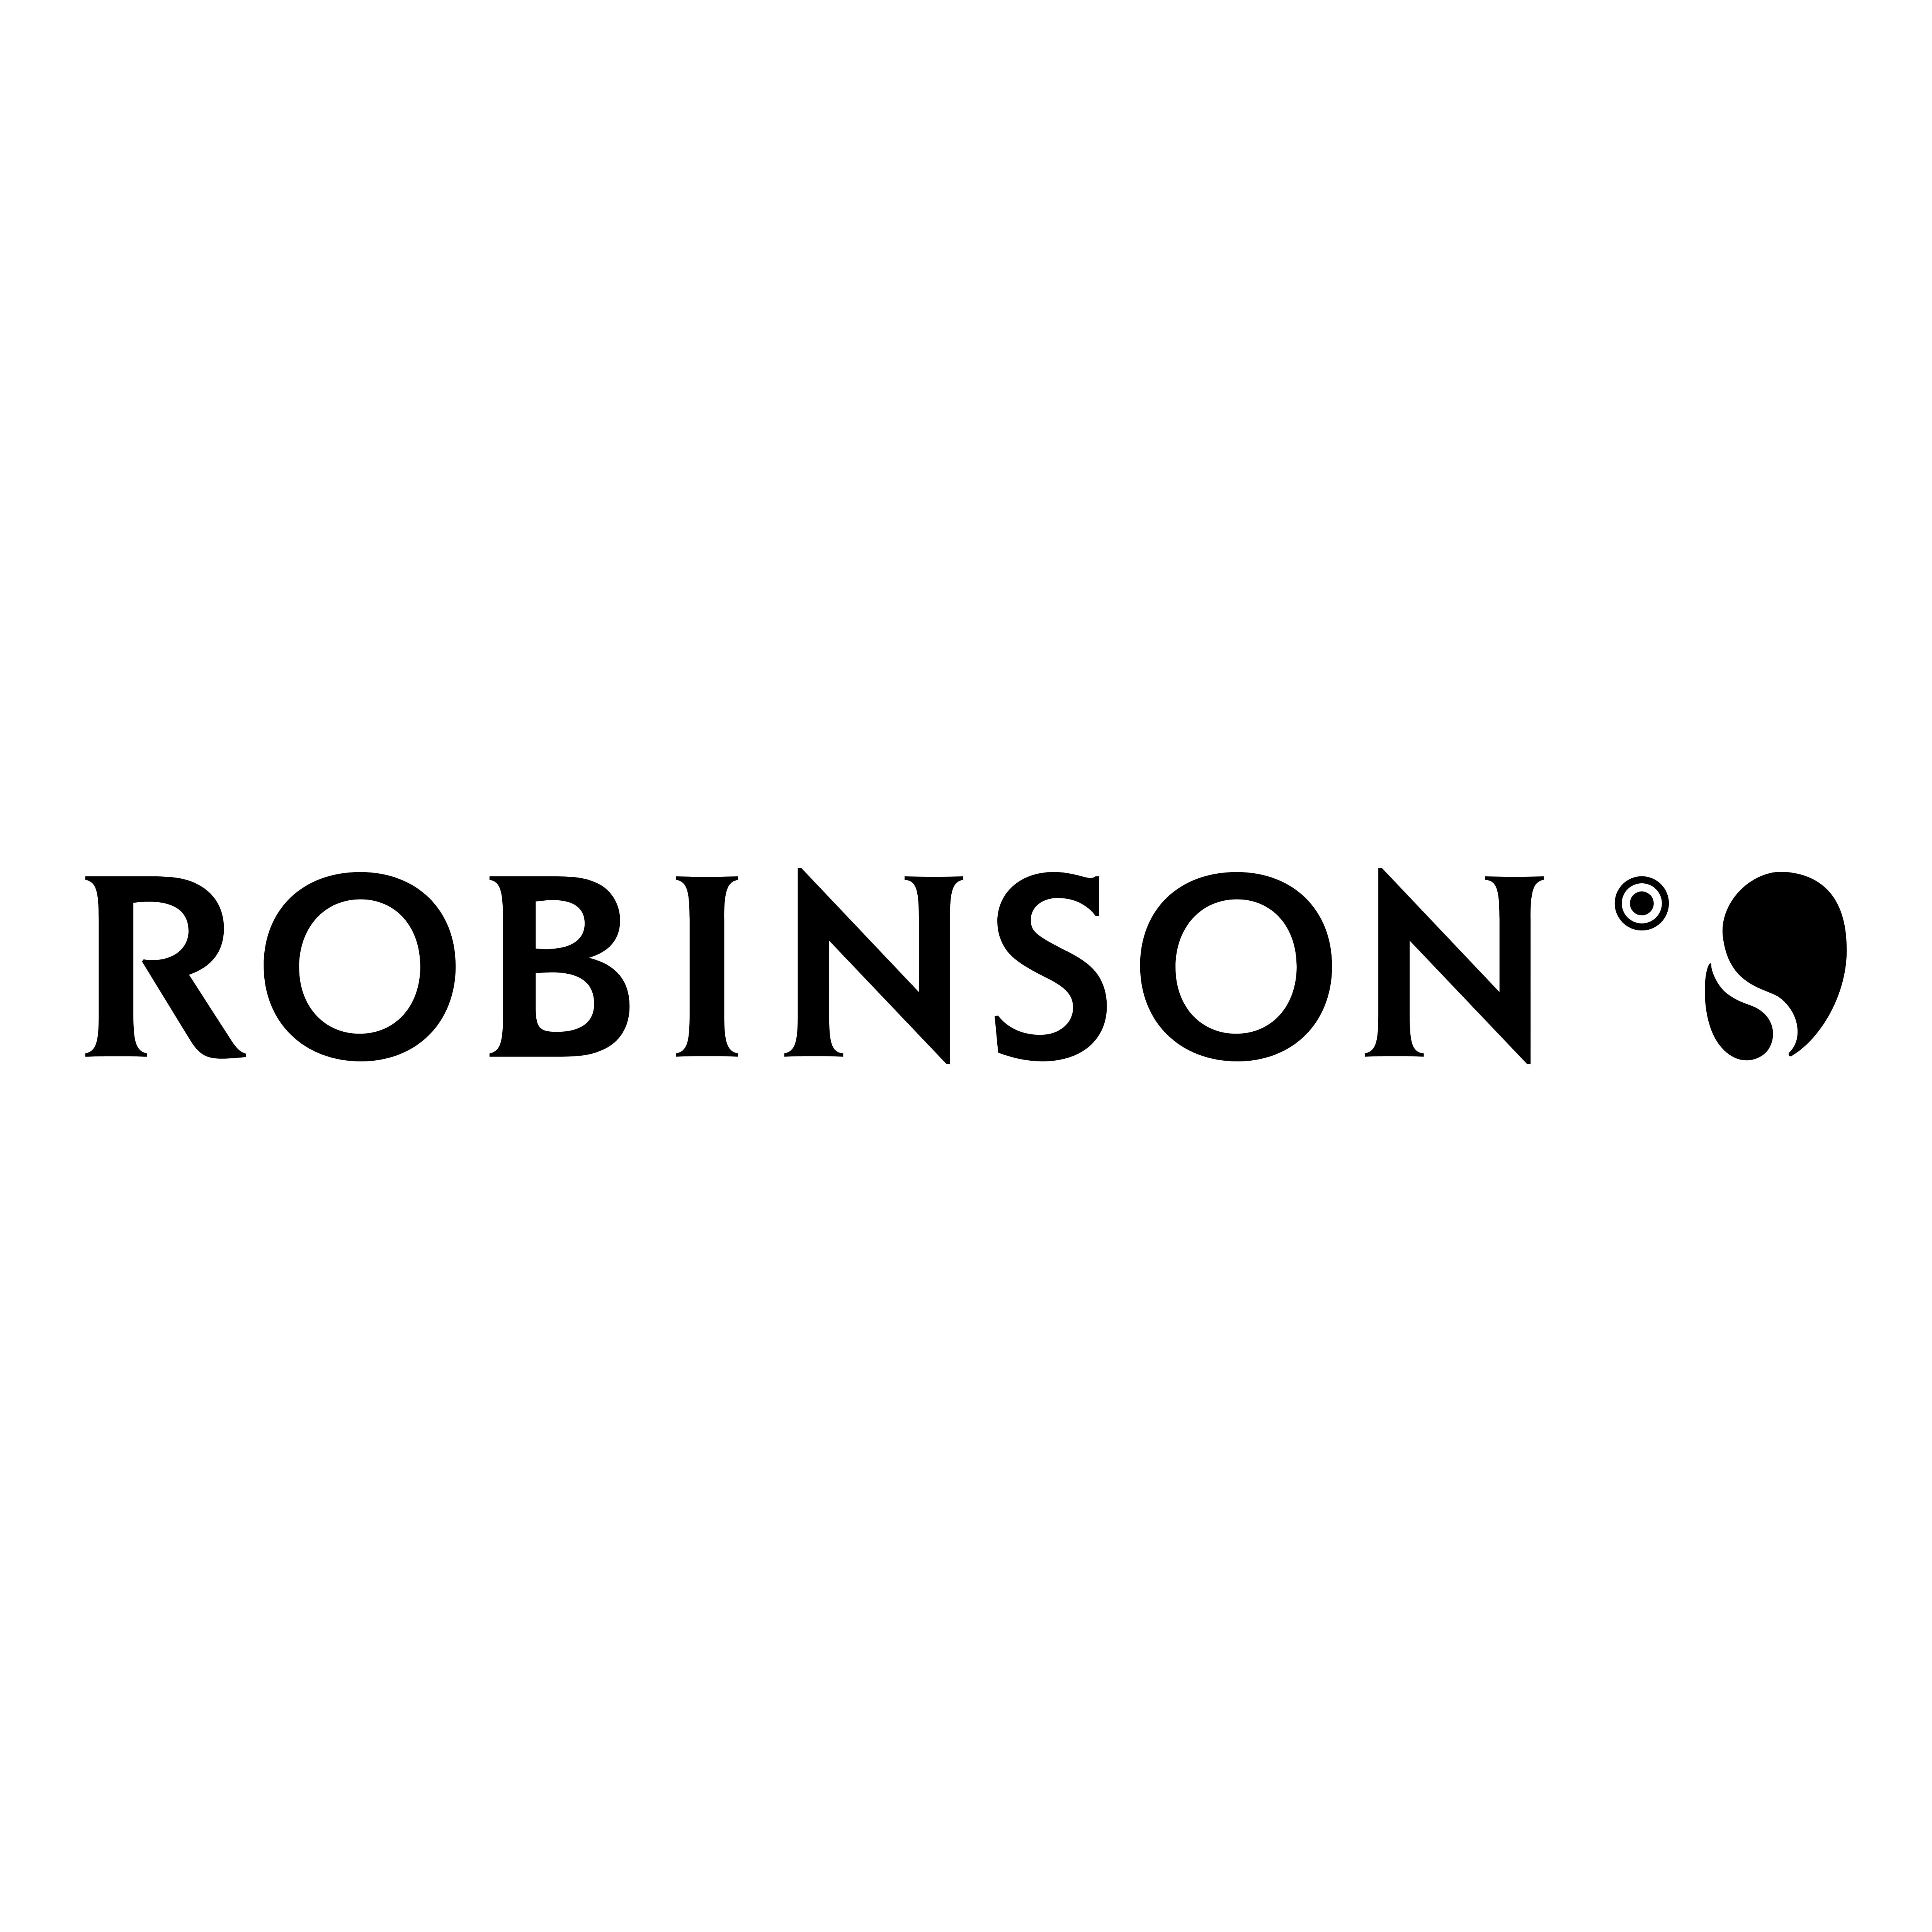 Robinson – Logos Download